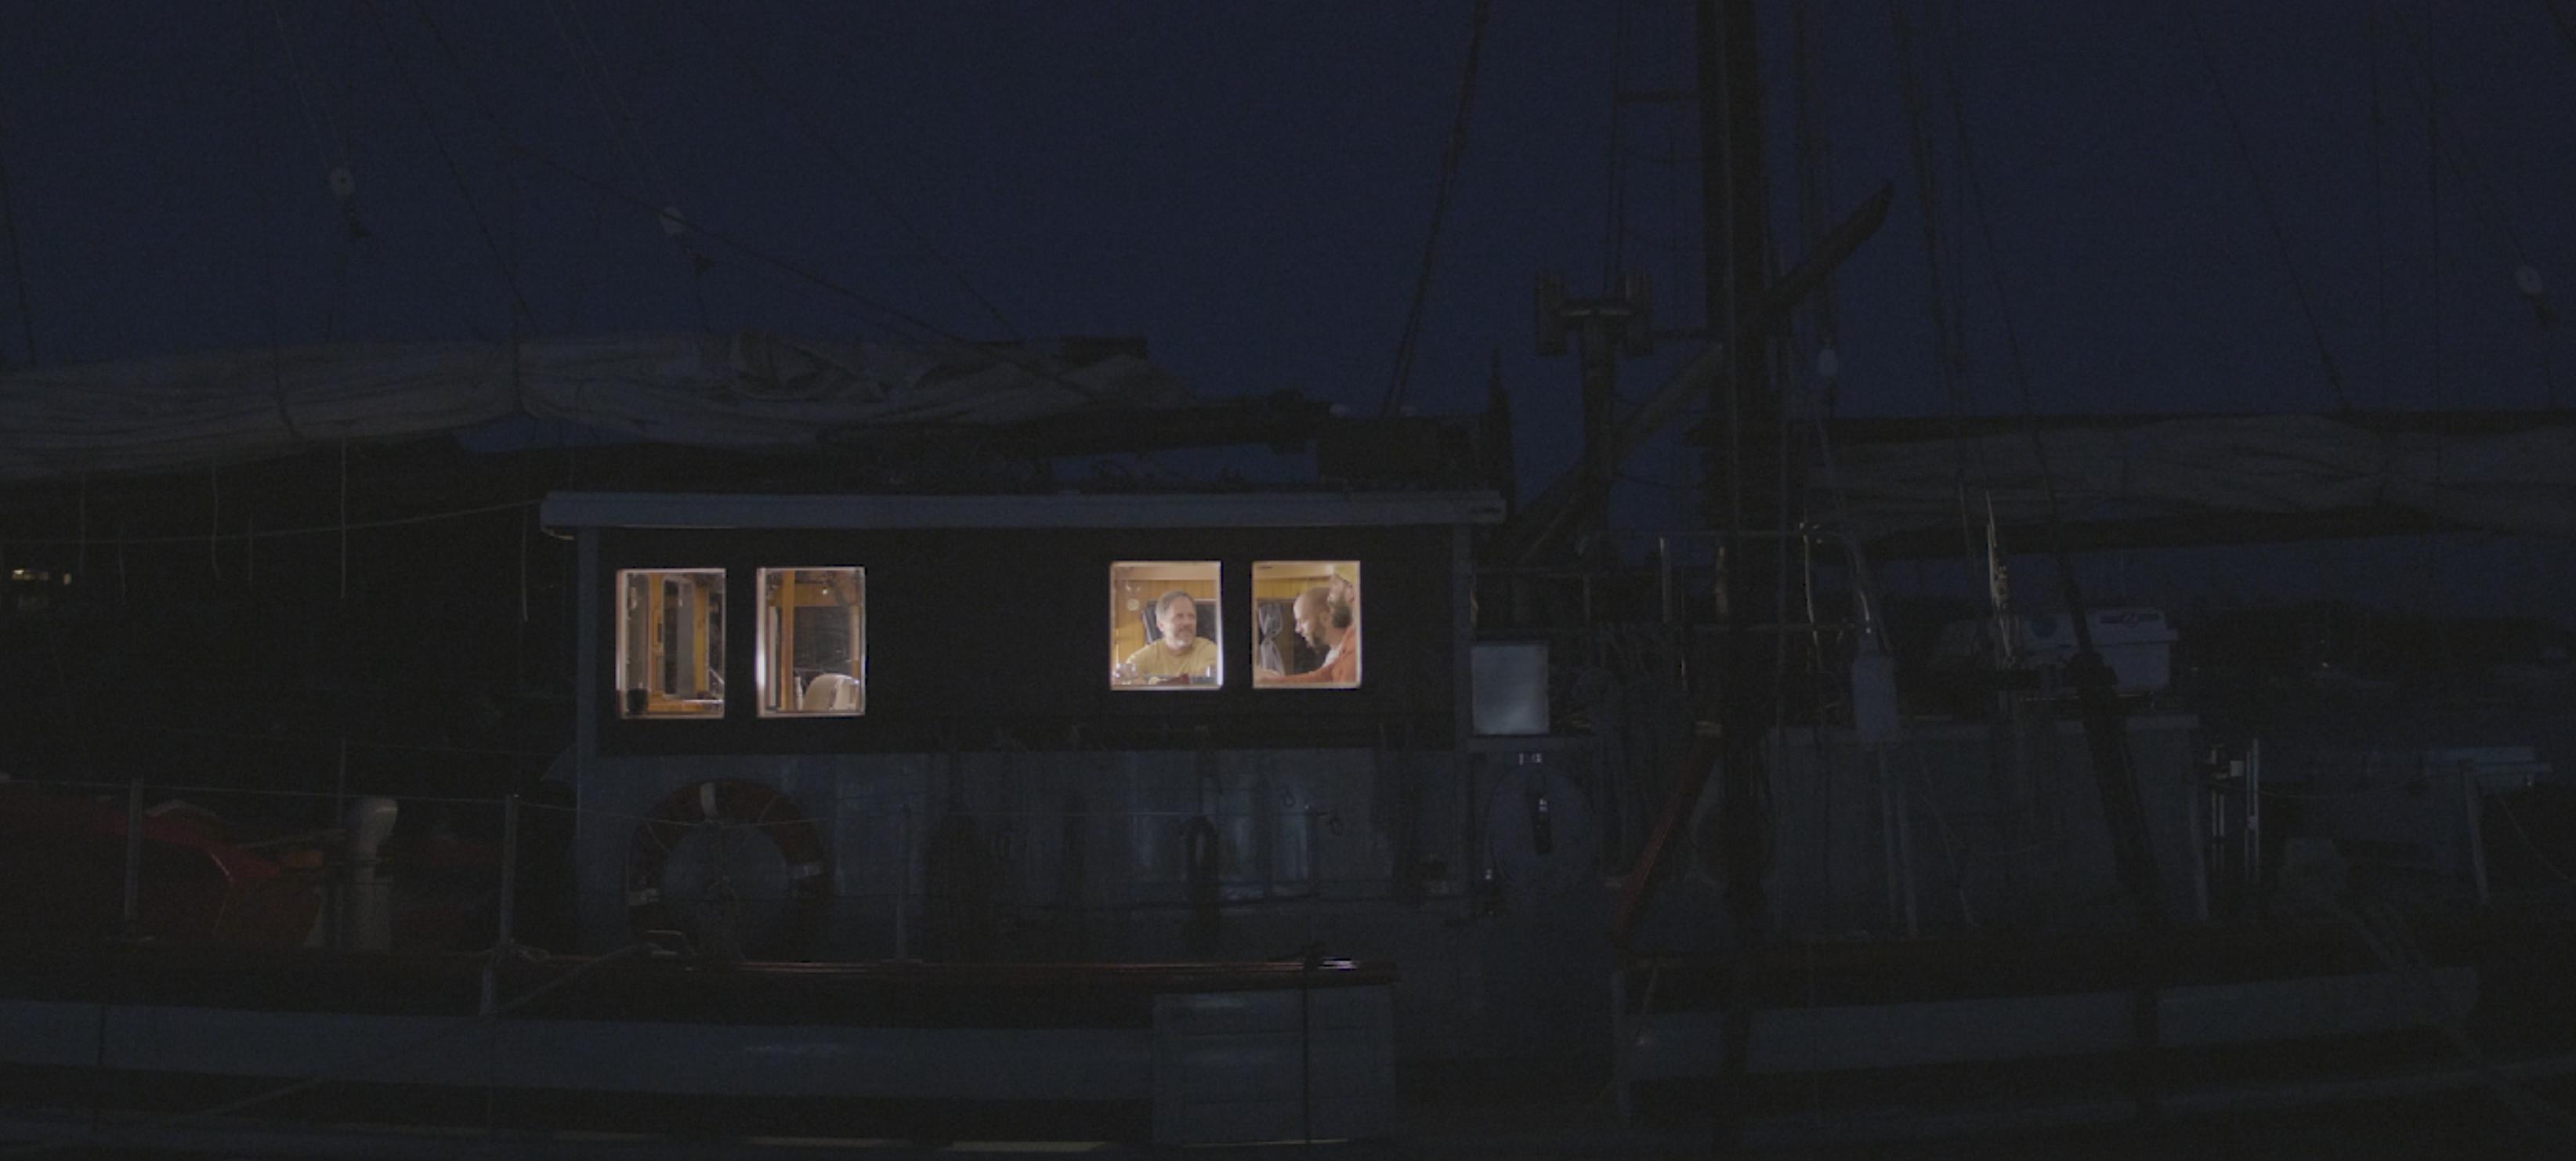 Farmer,Sailor,Chef Episode #1- The maiden voyage